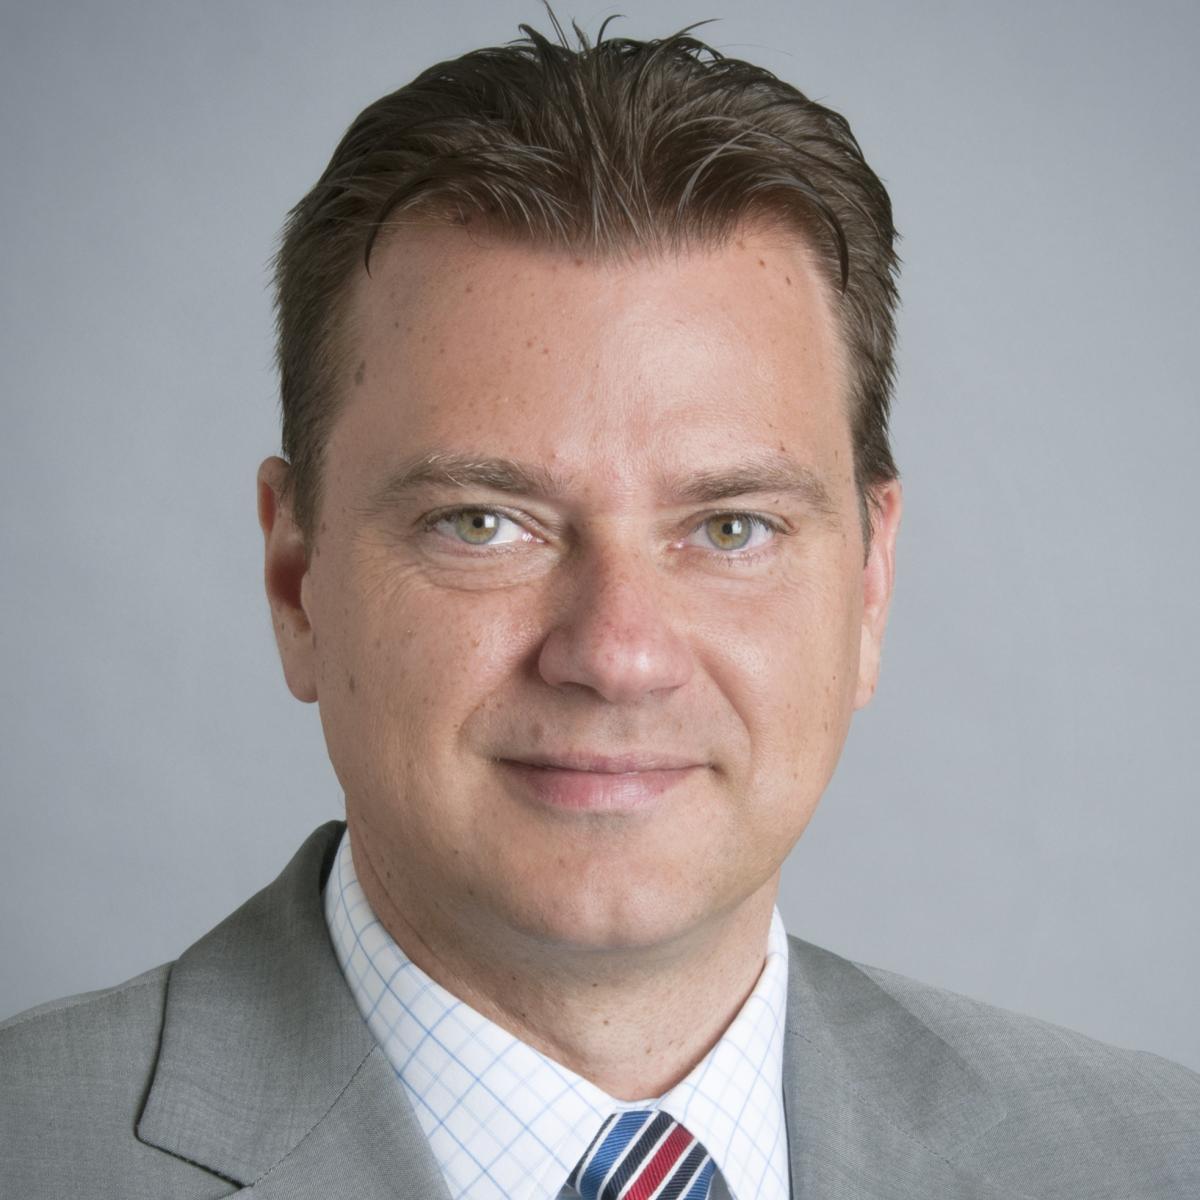 Dr Robert Zivadinov